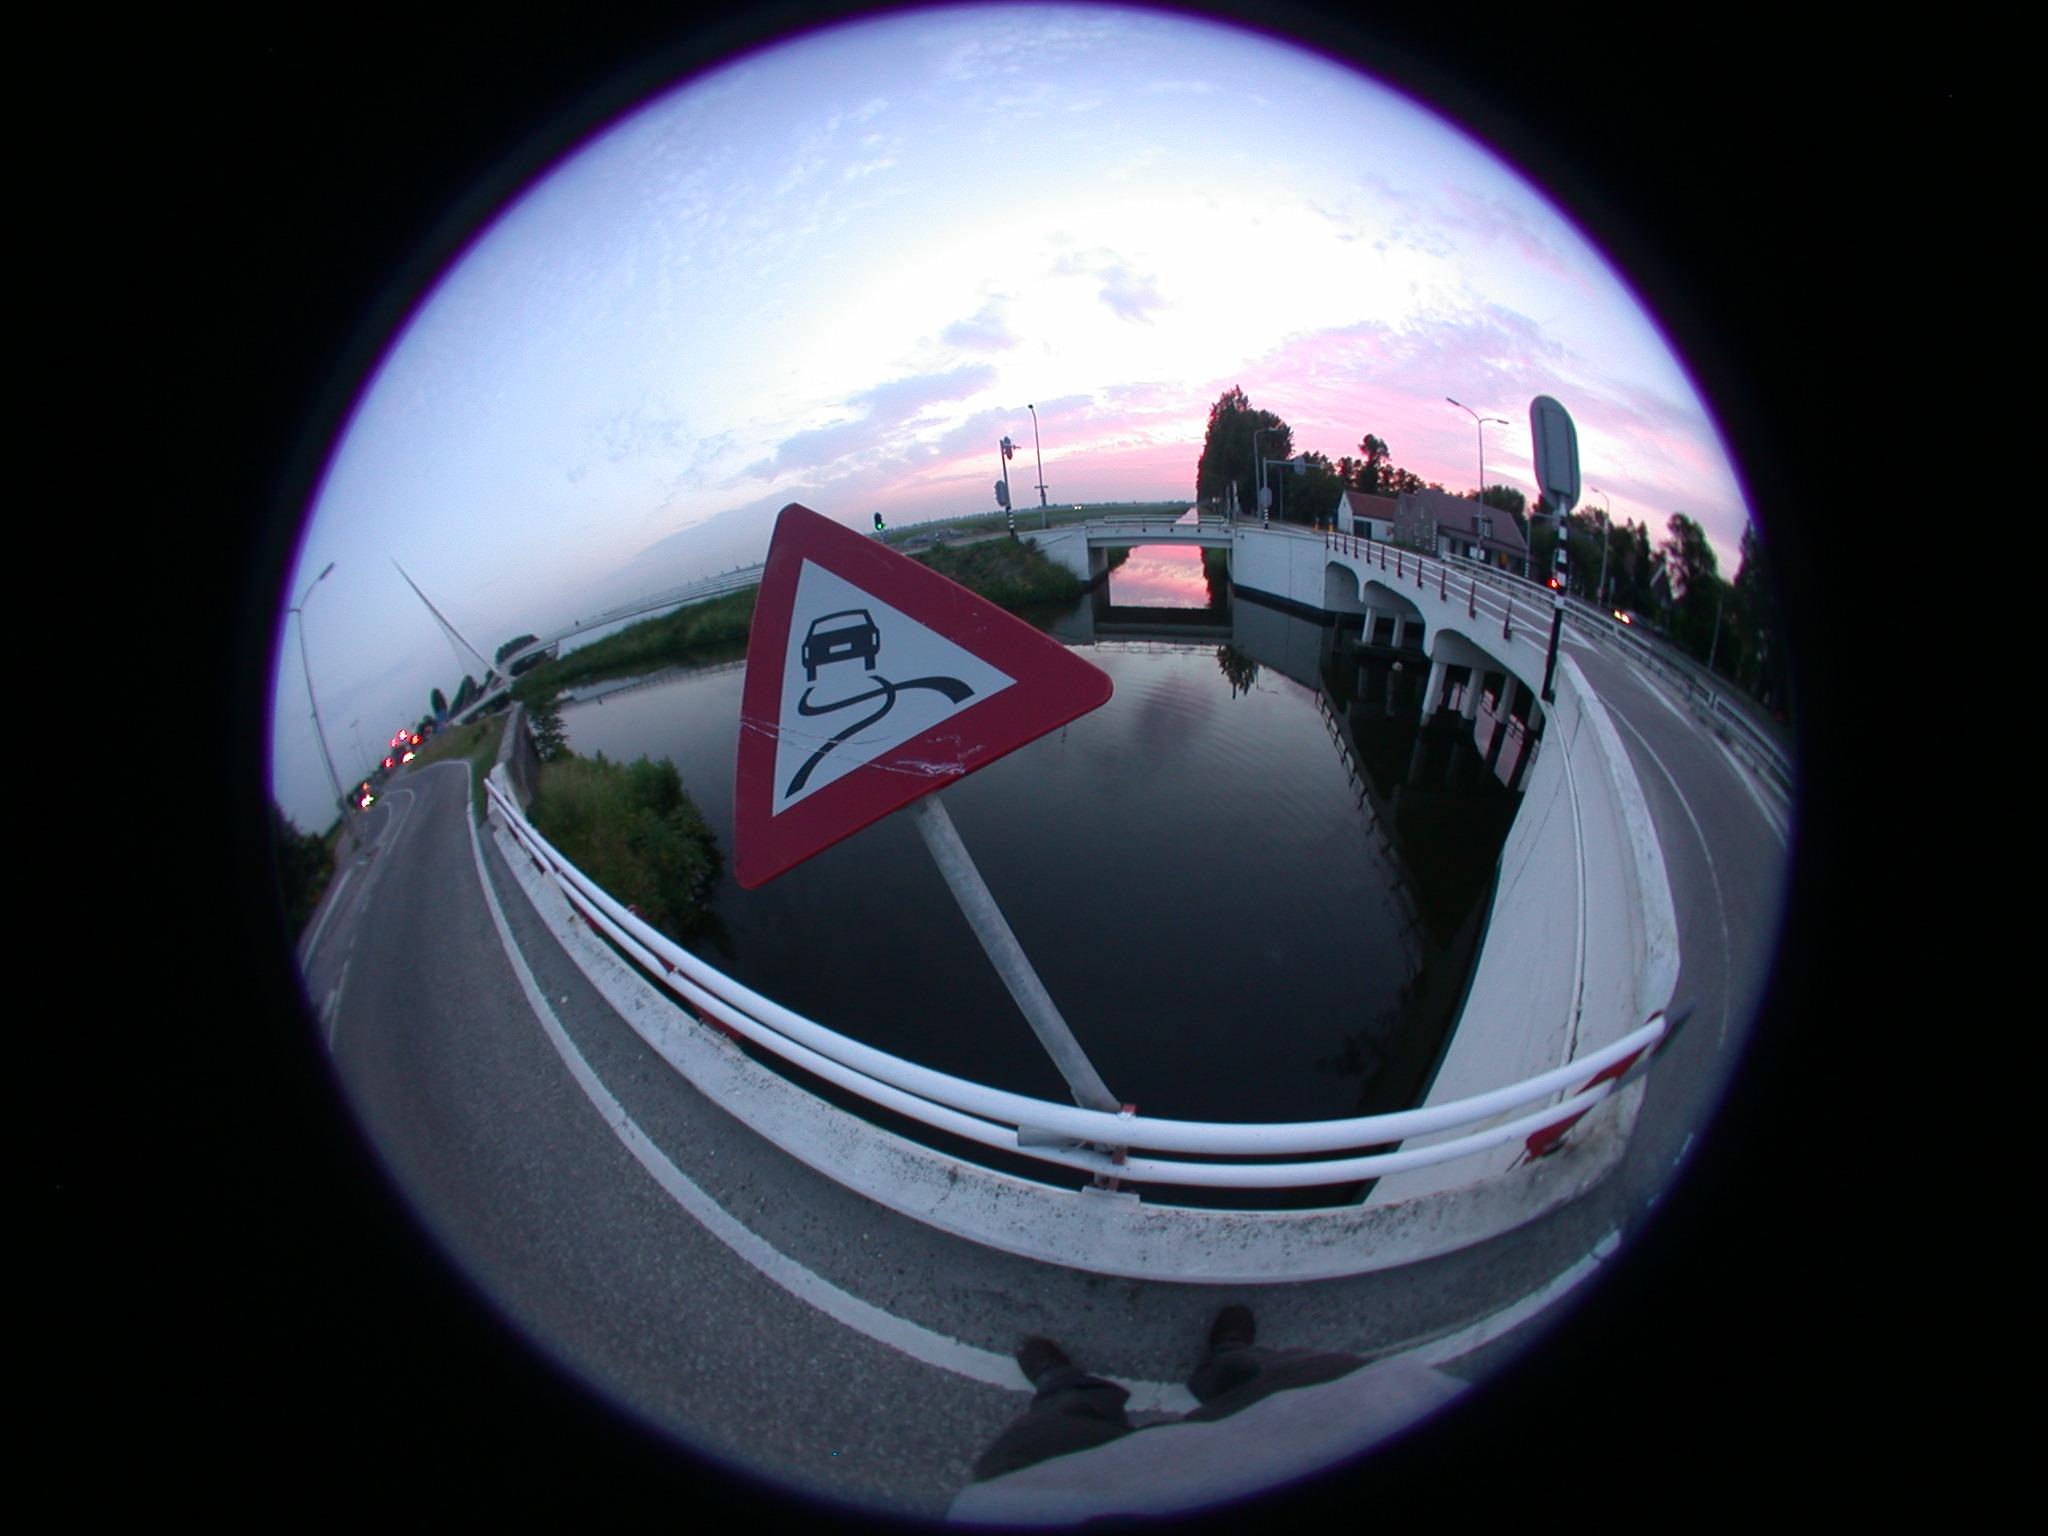 bridge fisheye slippery when wet distort